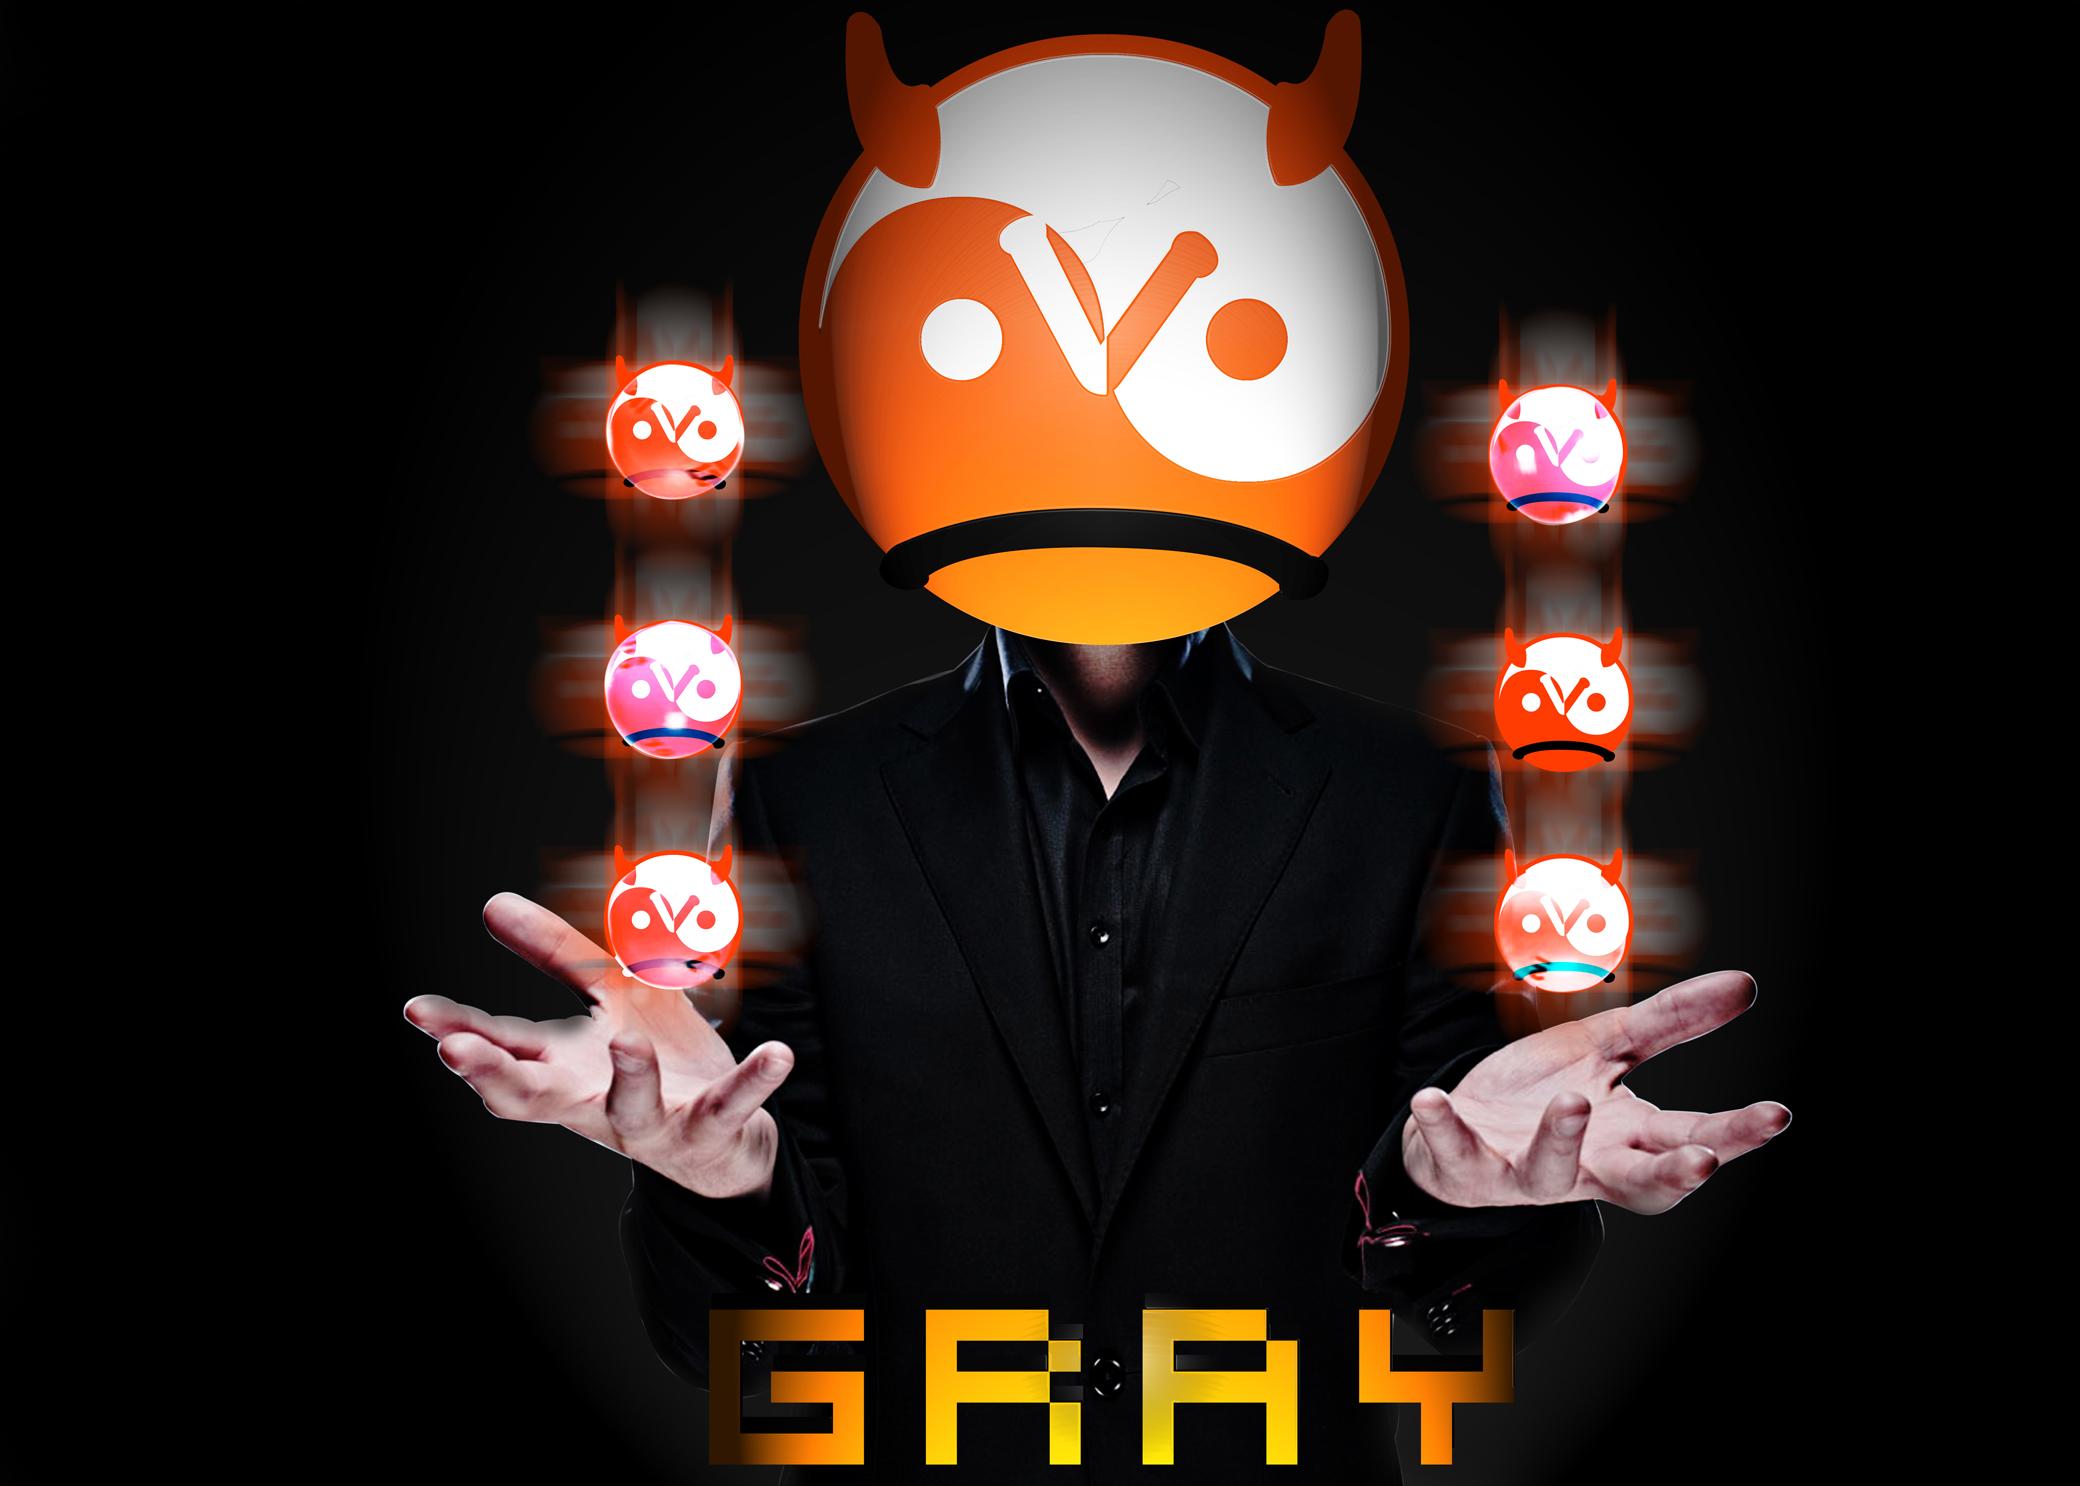 Mad guy